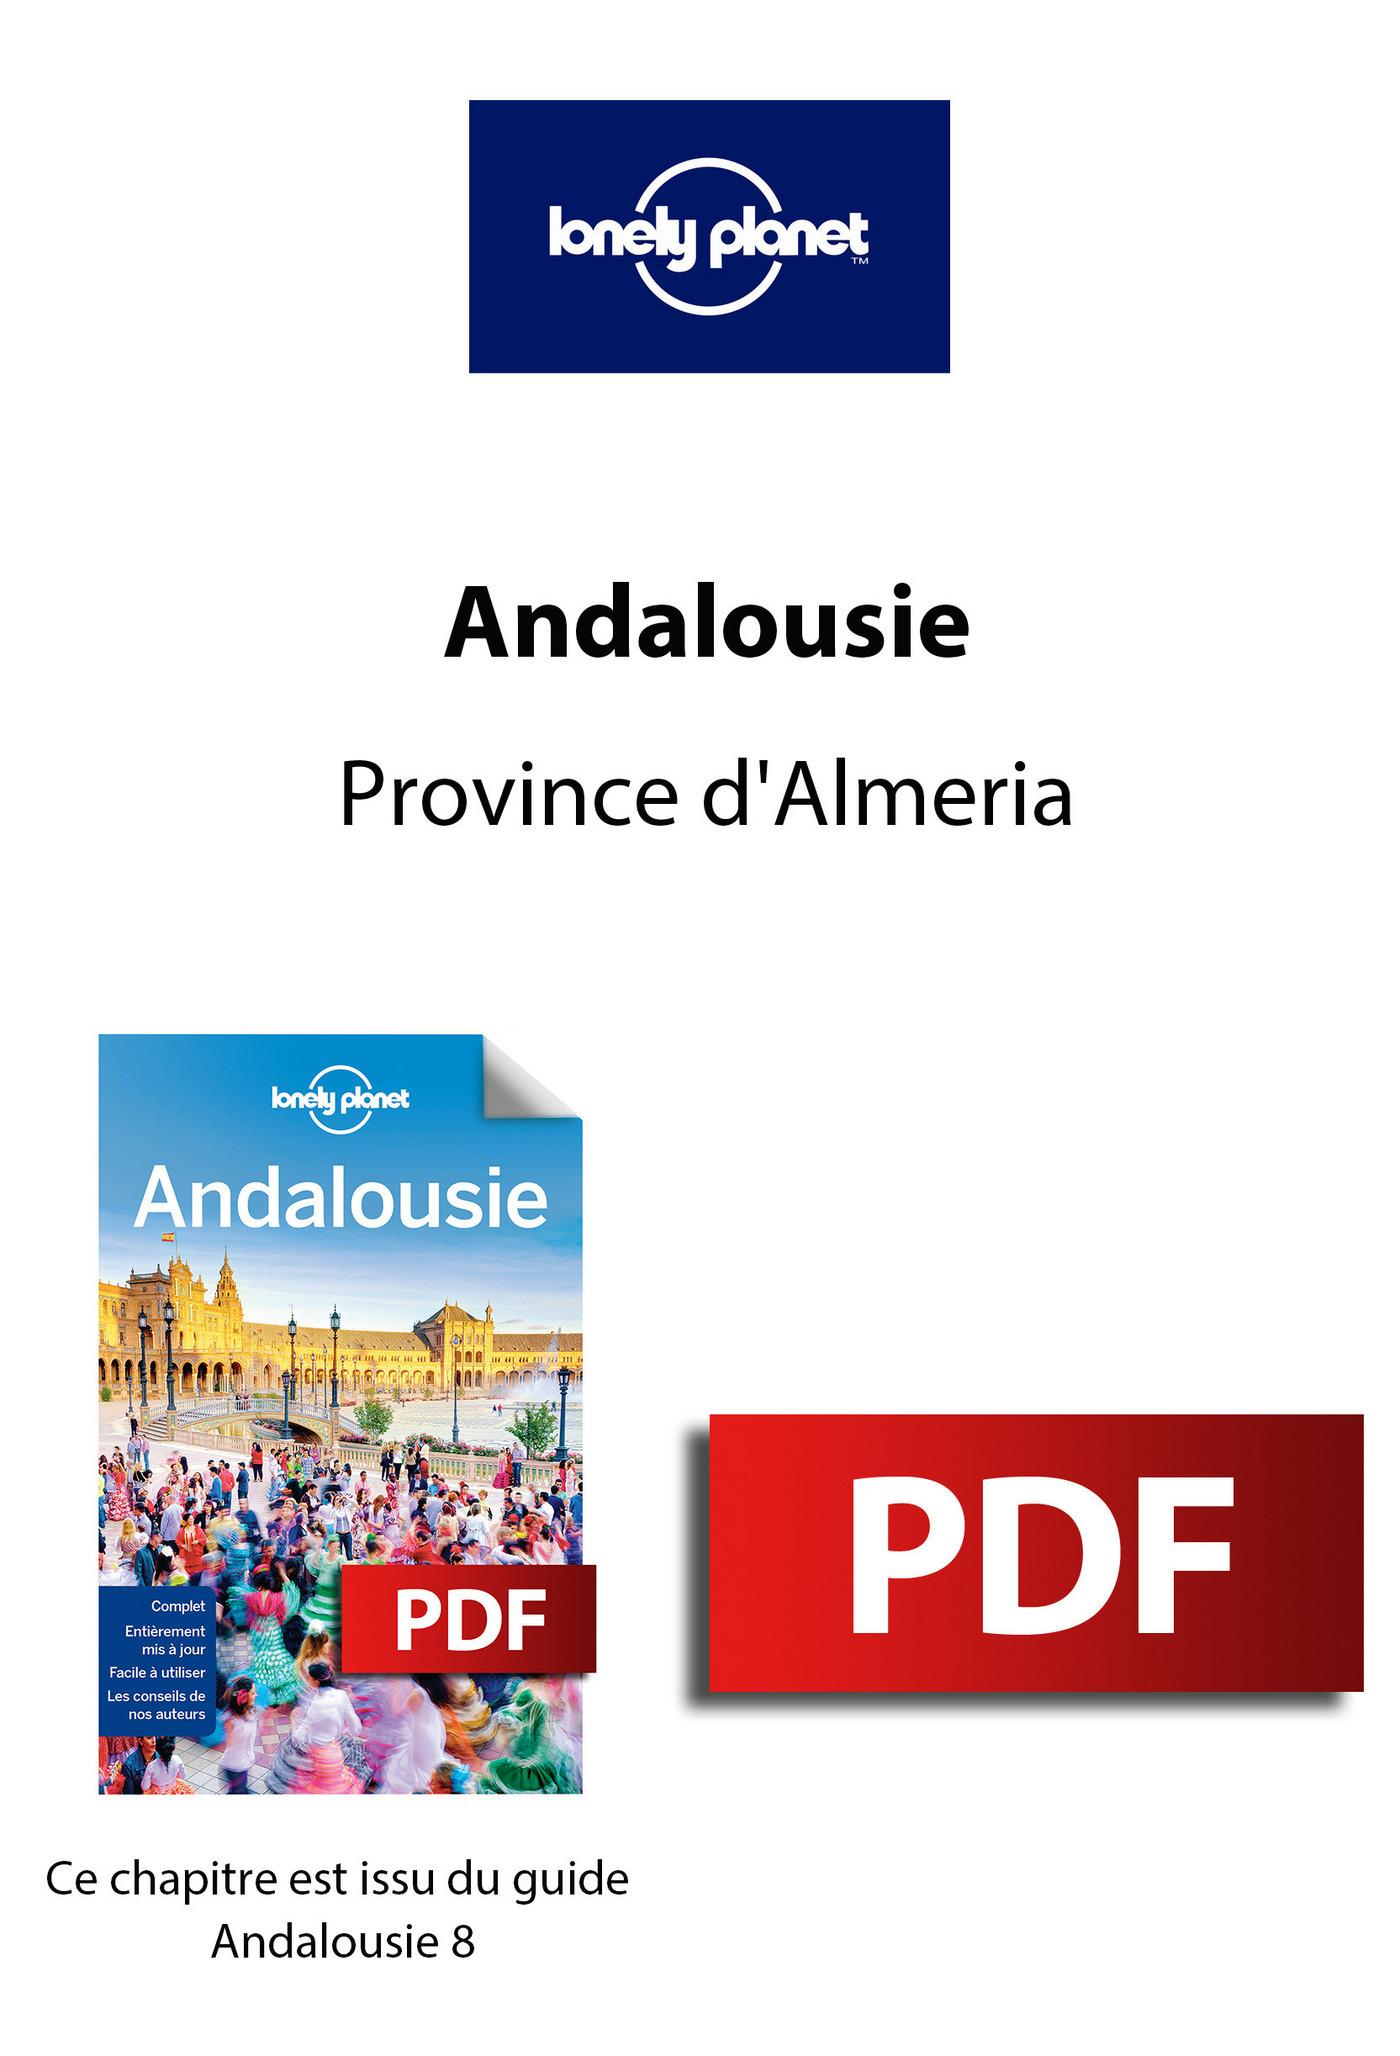 Andalousie - Province d'Almeria